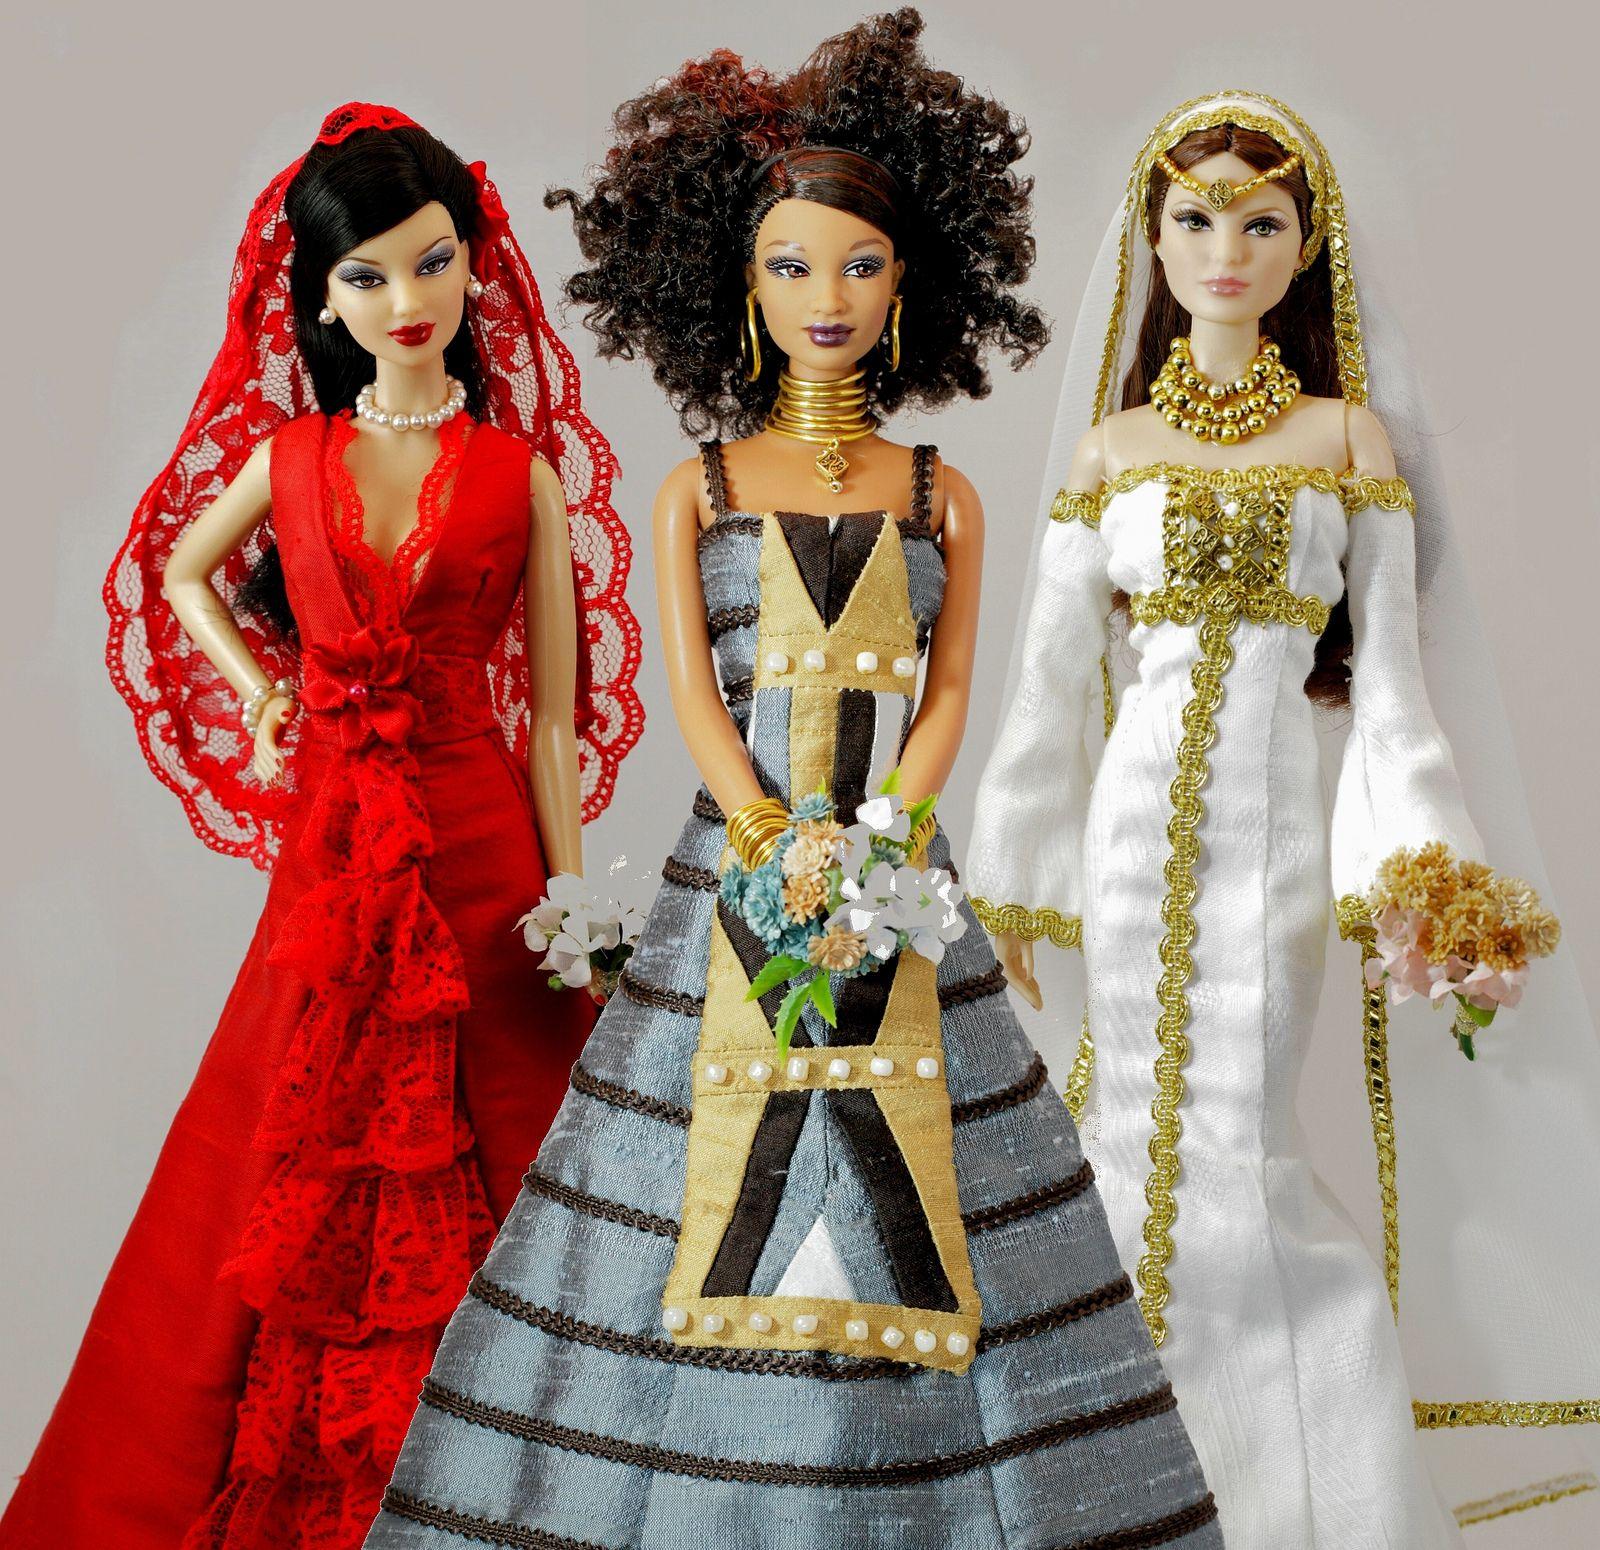 Therez Fleetwood Wedding Gowns: Miniature Wedding Gown Keepsakes